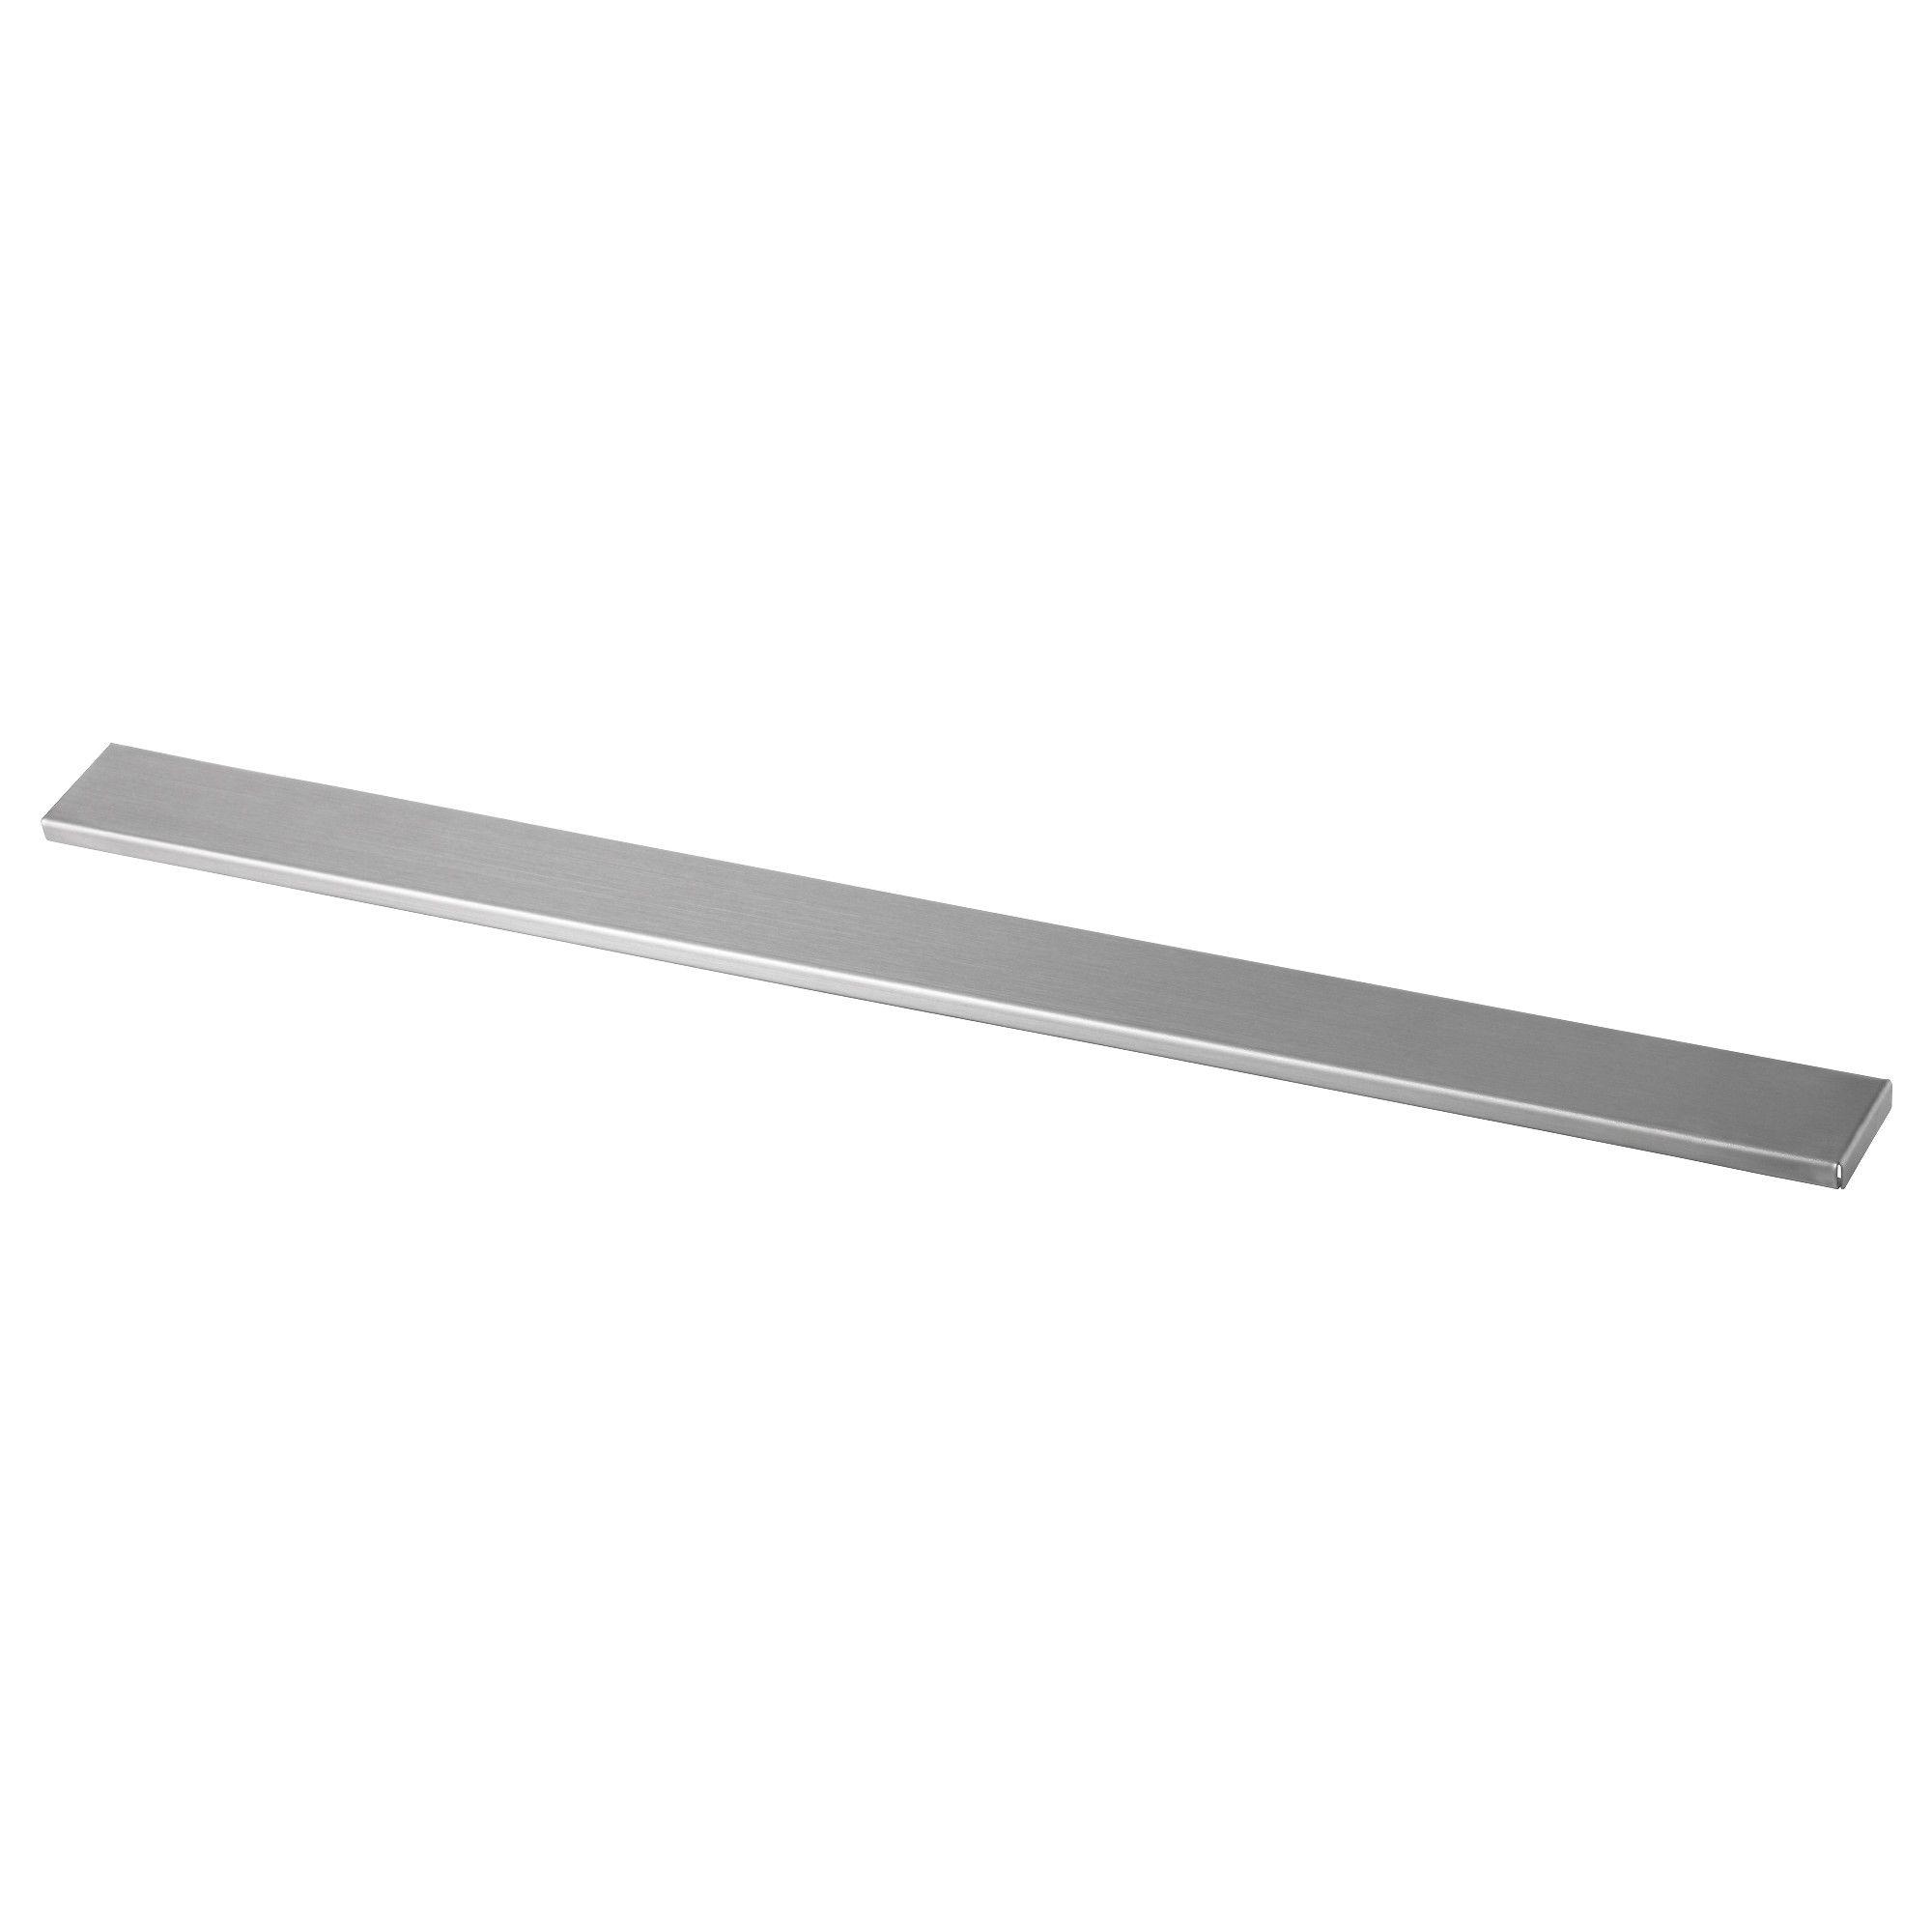 RIMFORSA Rail stainless steel